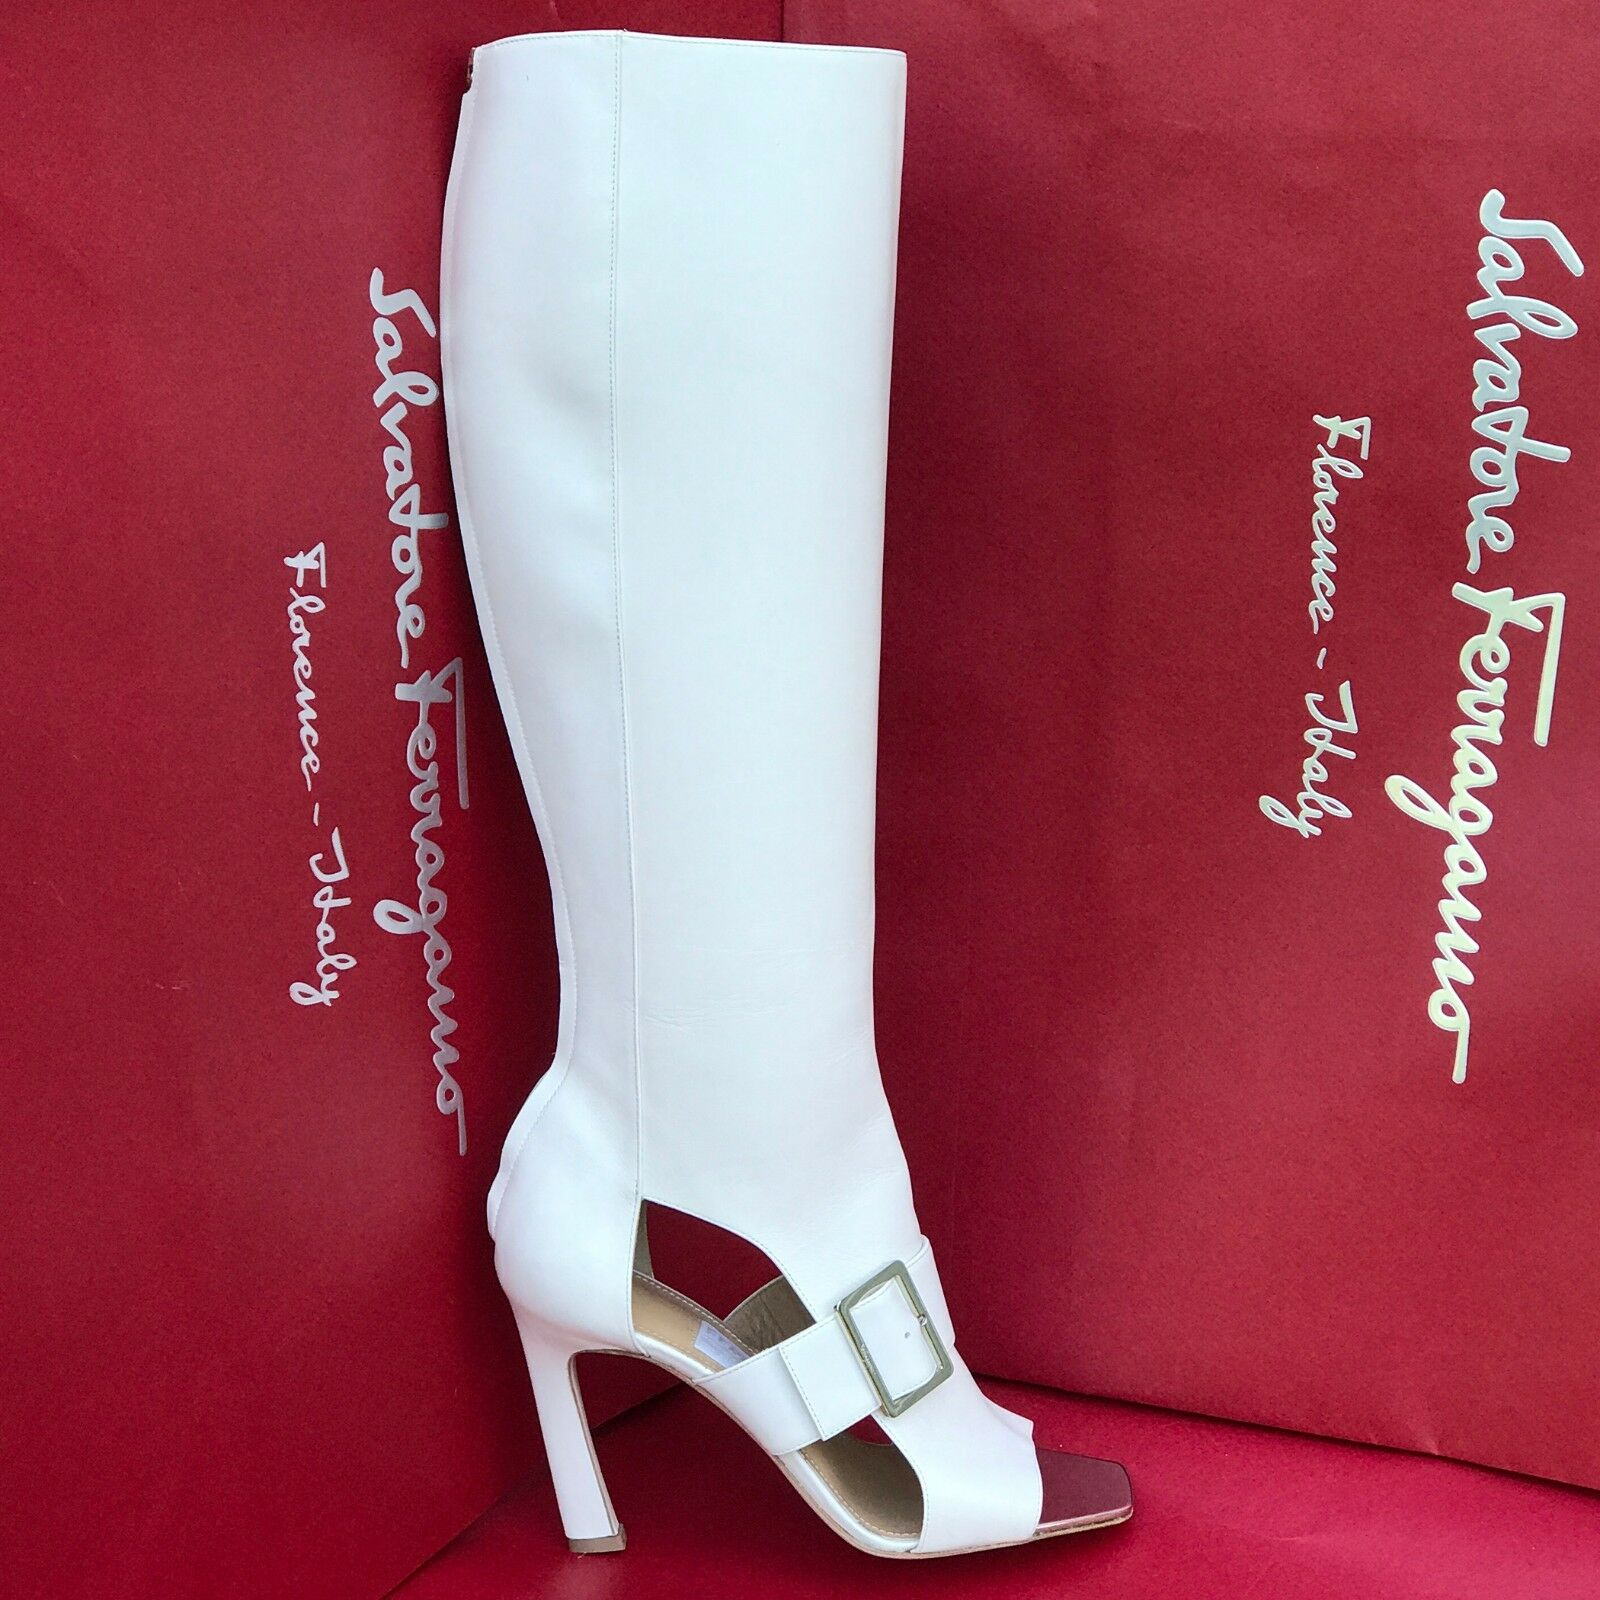 Ferragamo Women's Knee High PEGASUS 7 37.5 White Leather Boots Nude Wedding Club